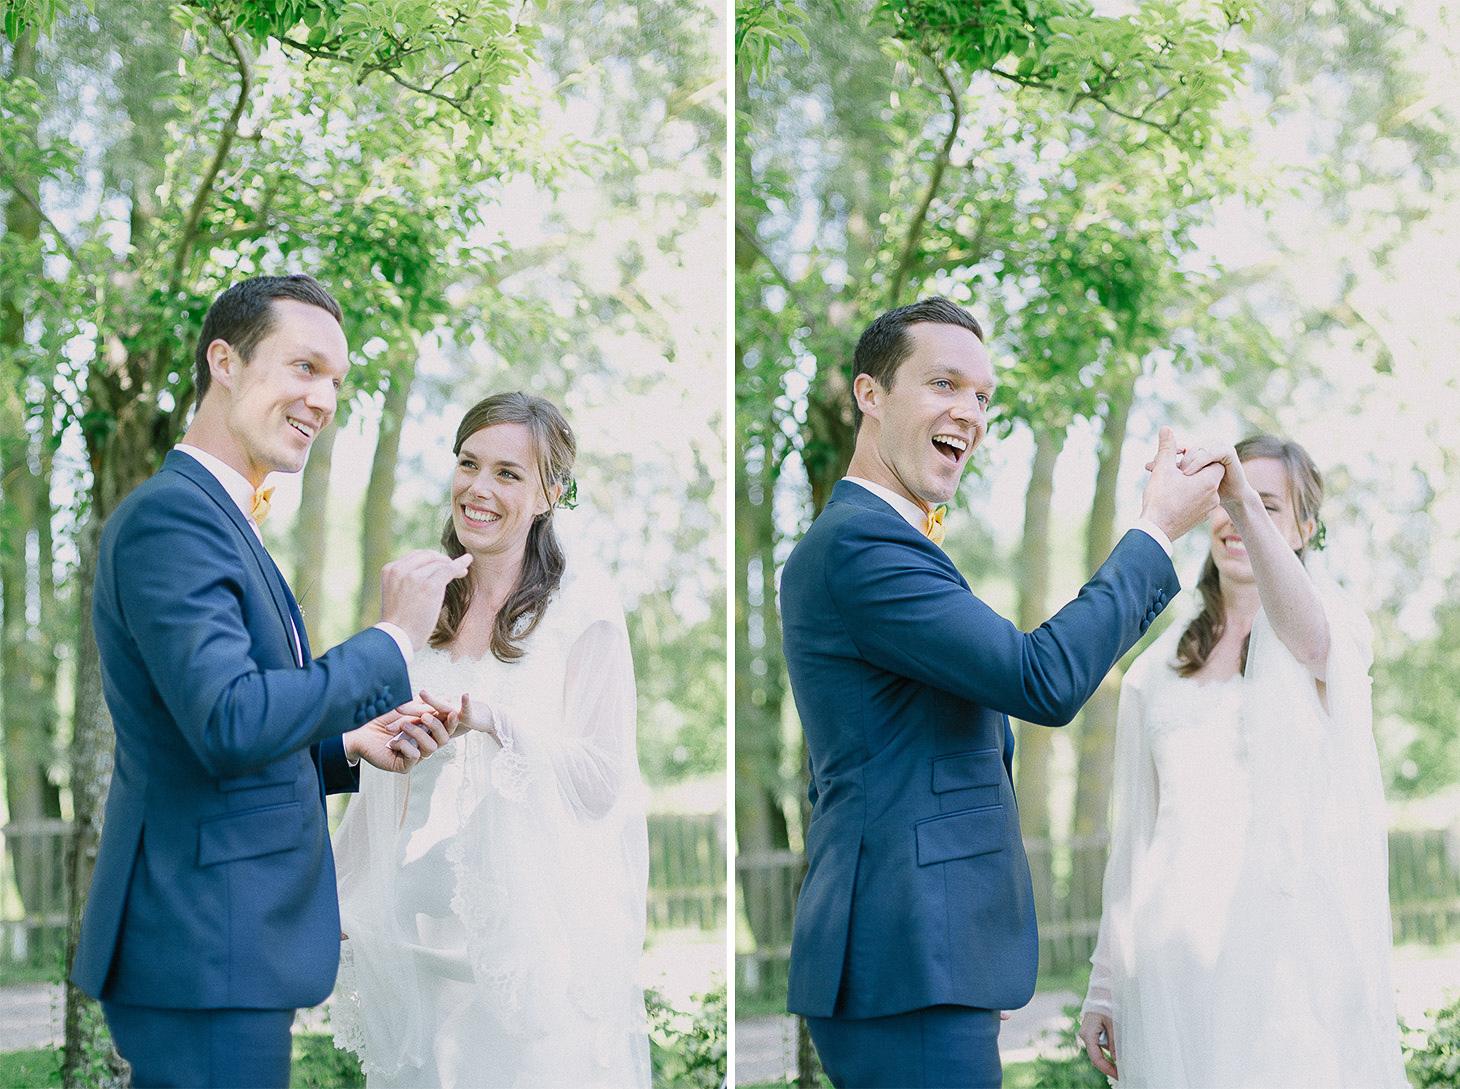 photographe-mariage-champ-de-launay-normandie-00037